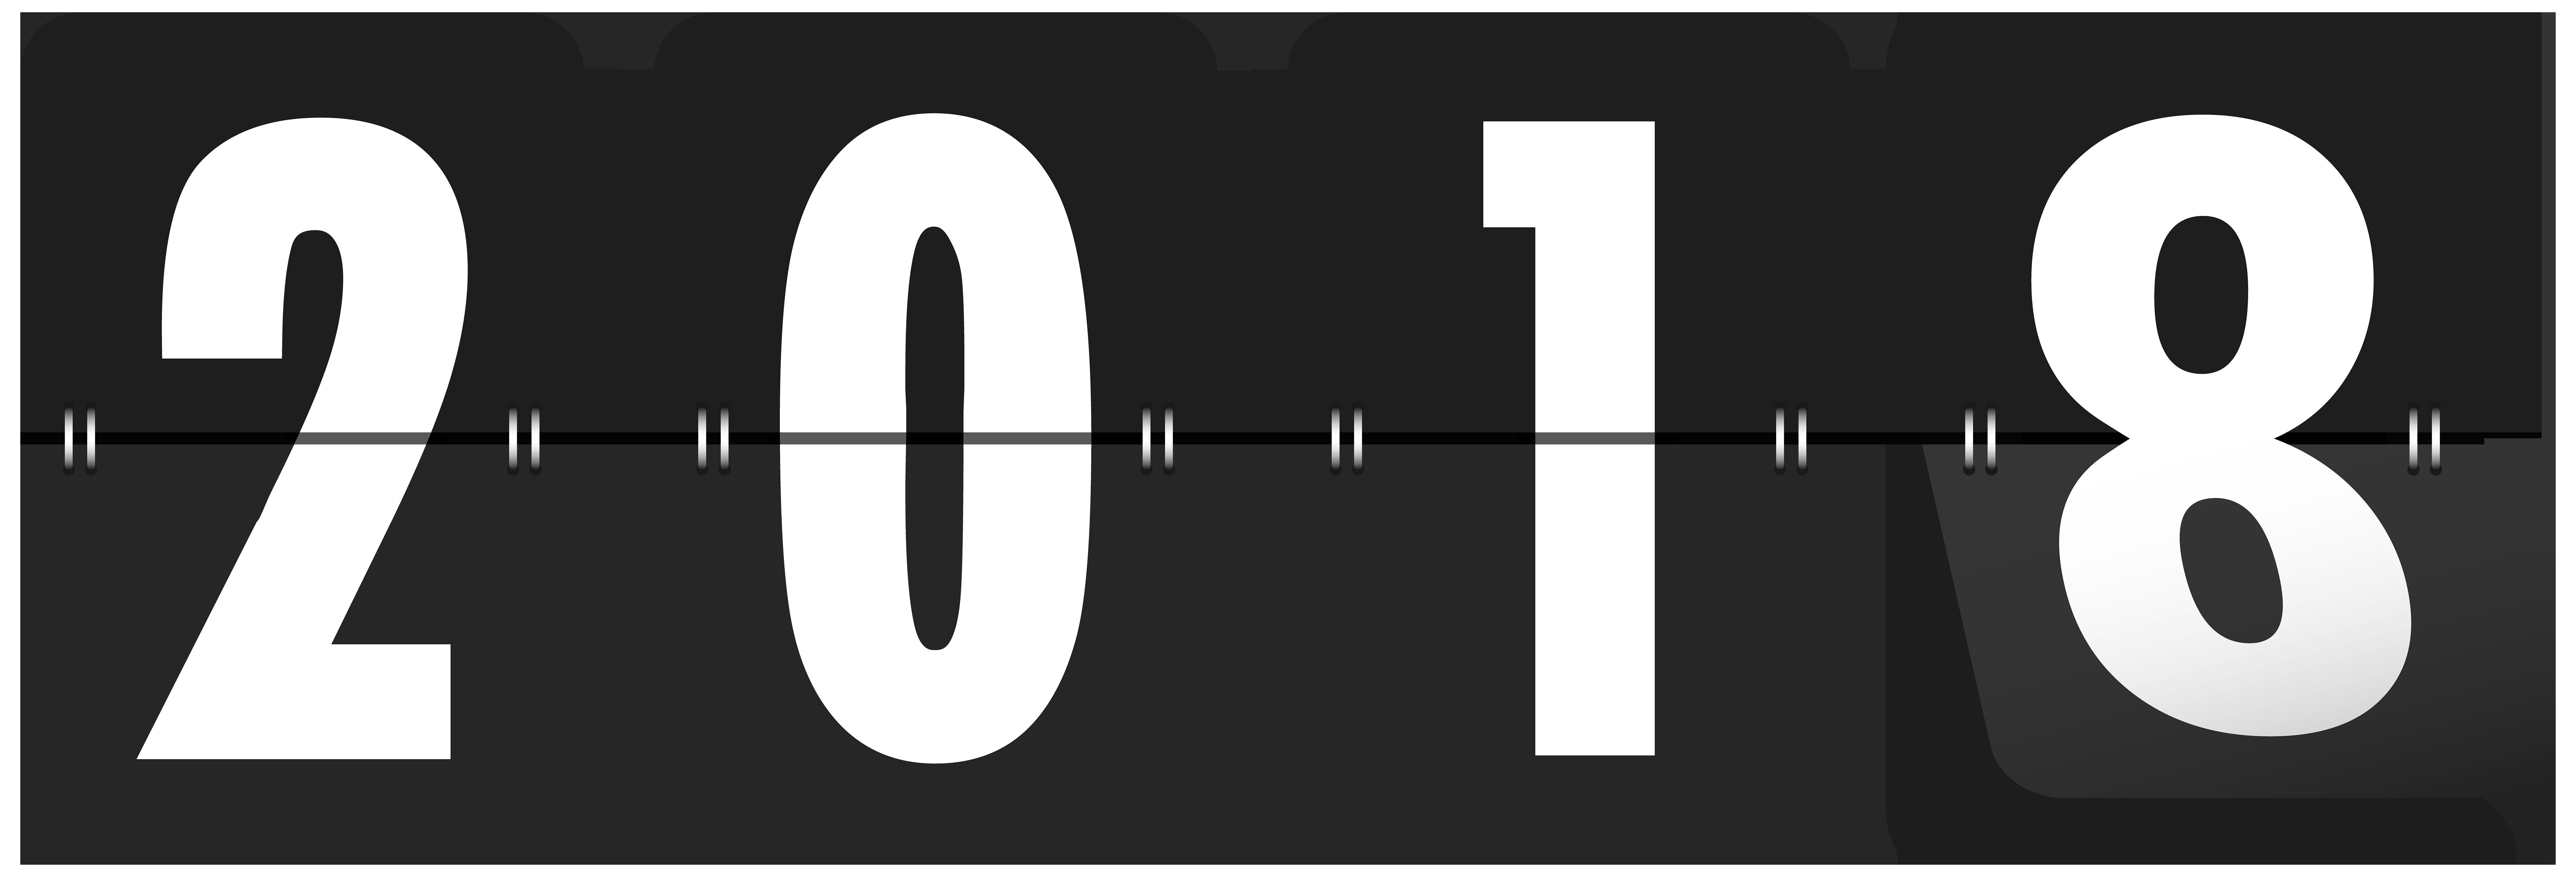 2018 clipart logo.  black transparent clip